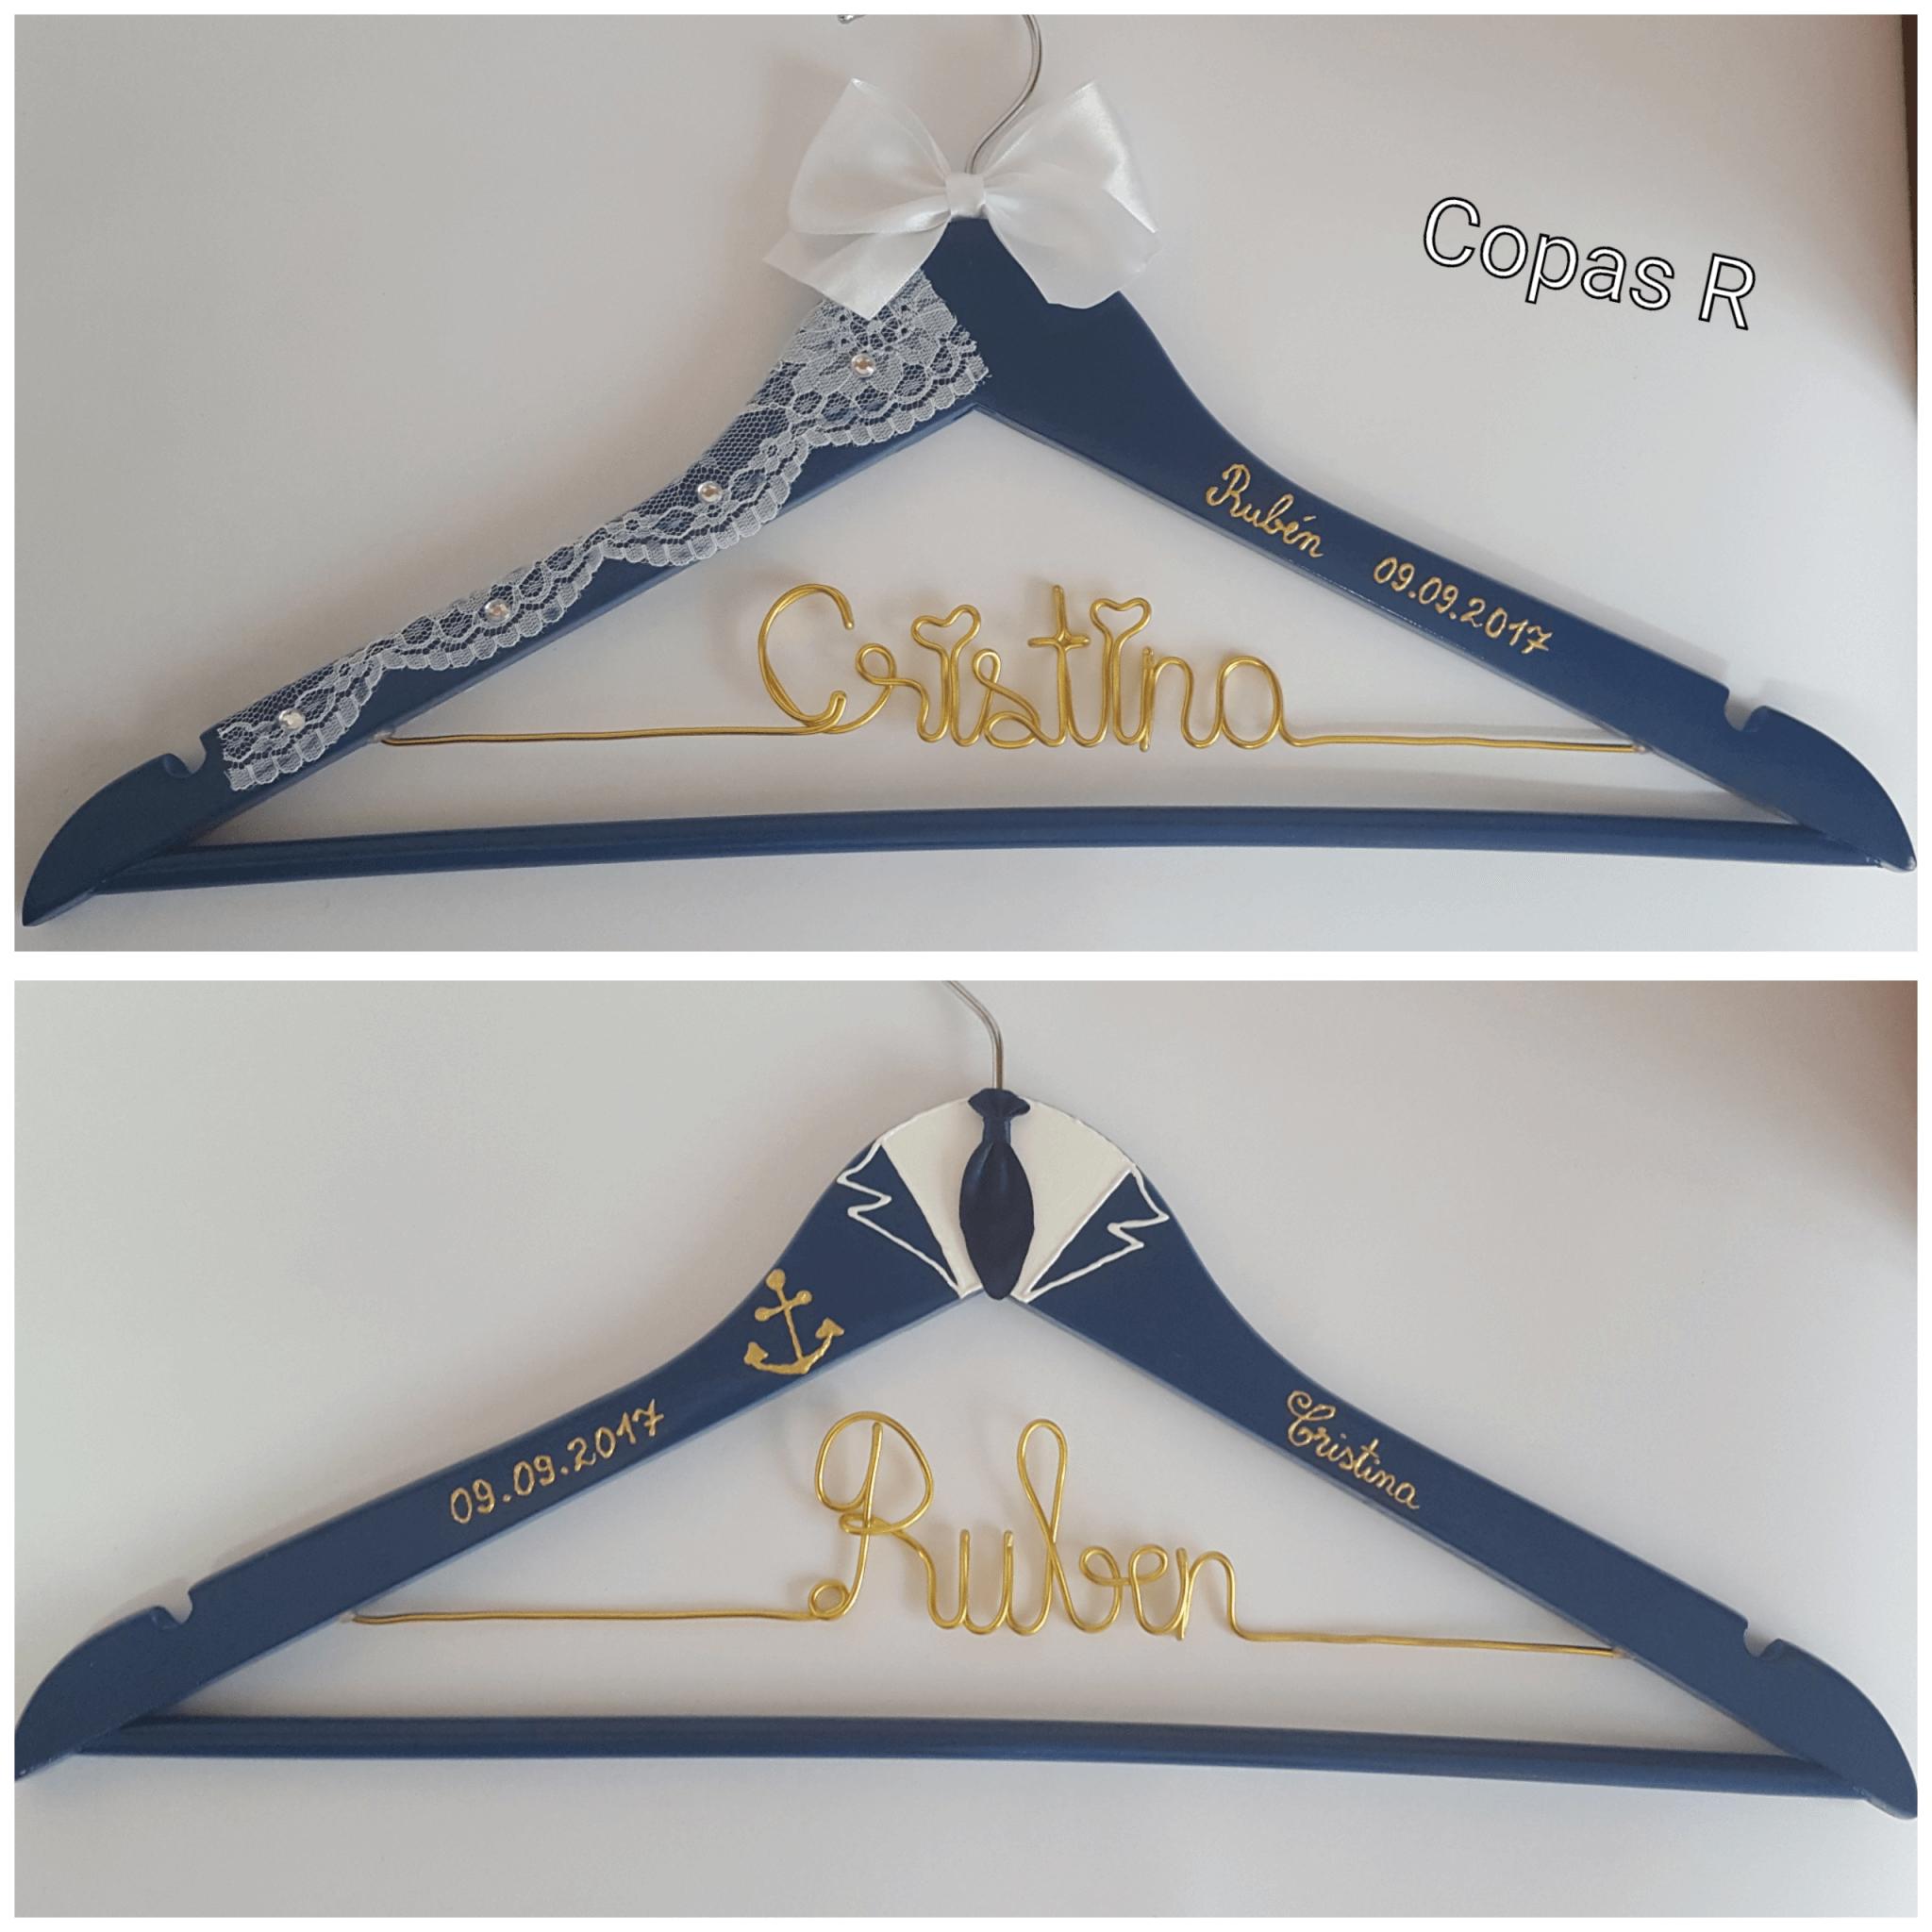 perchas personalizadas perchas personalizadas - perchas personalizadas 10 - Perchas personalizadas | perchas novios | perchas personalizadas boda